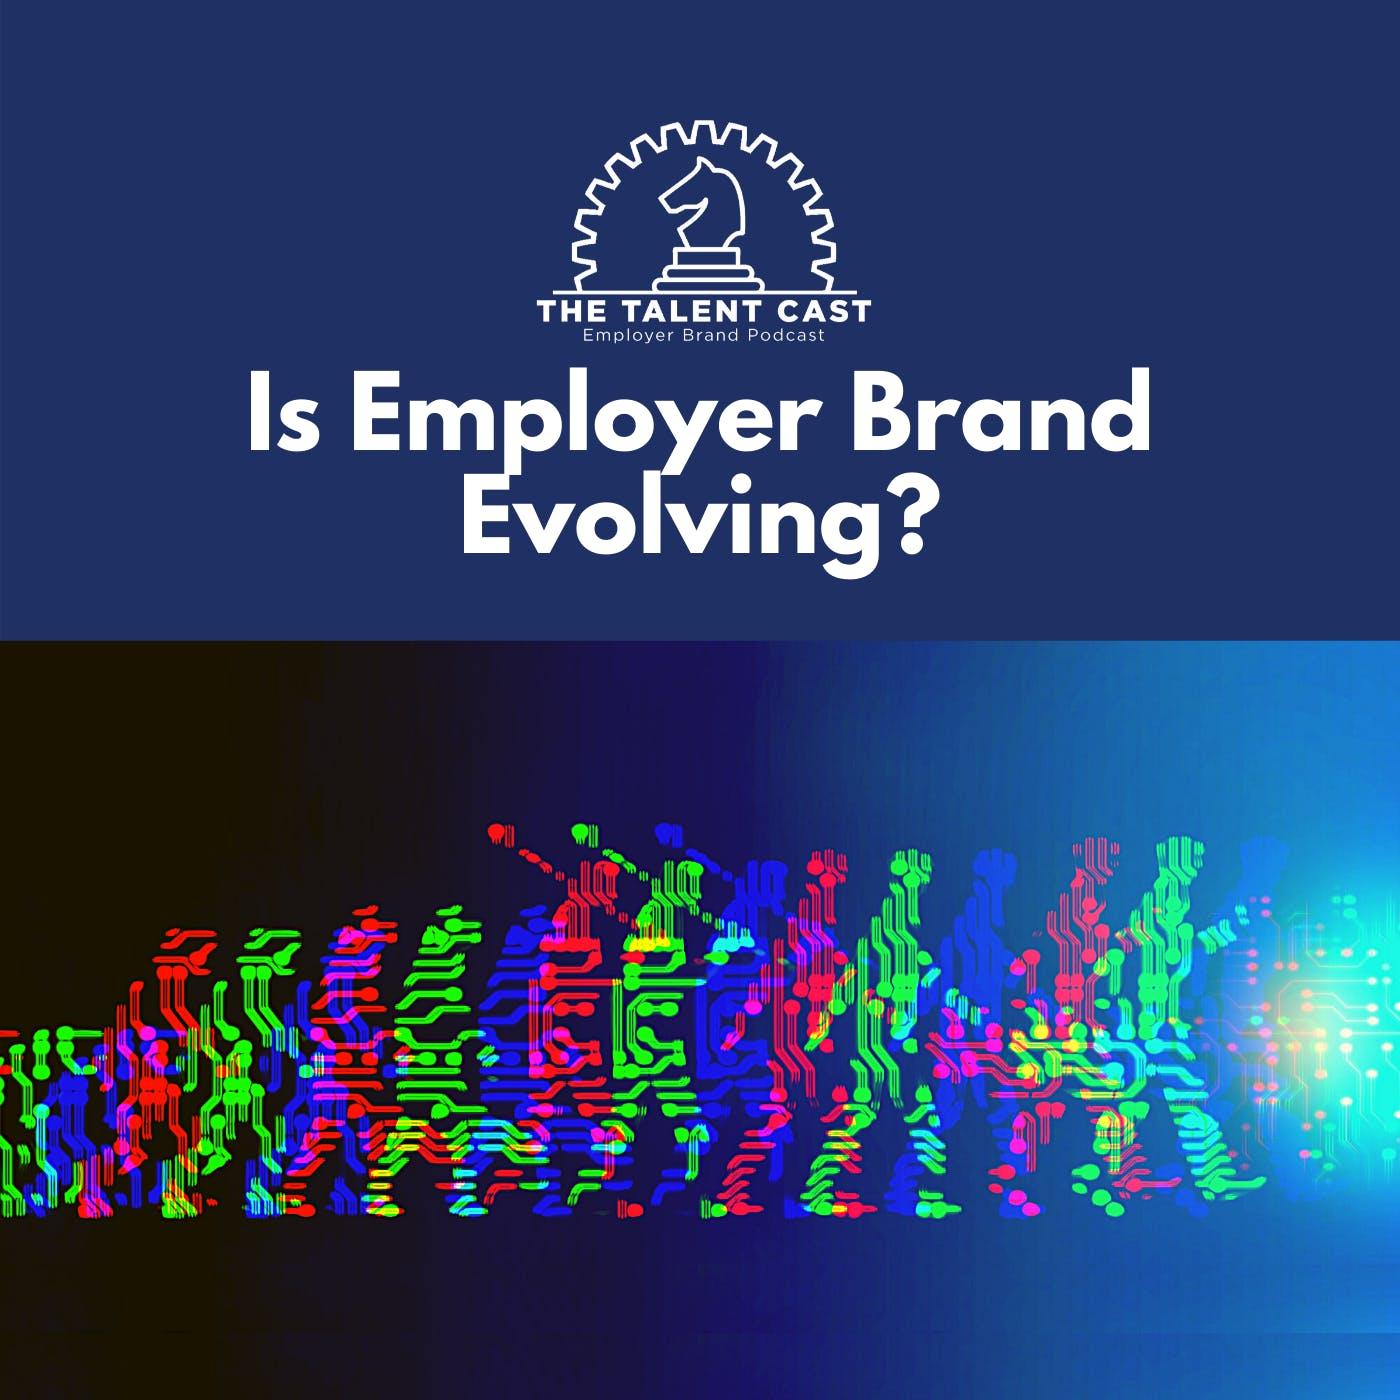 Is Employer Brand Evolving?